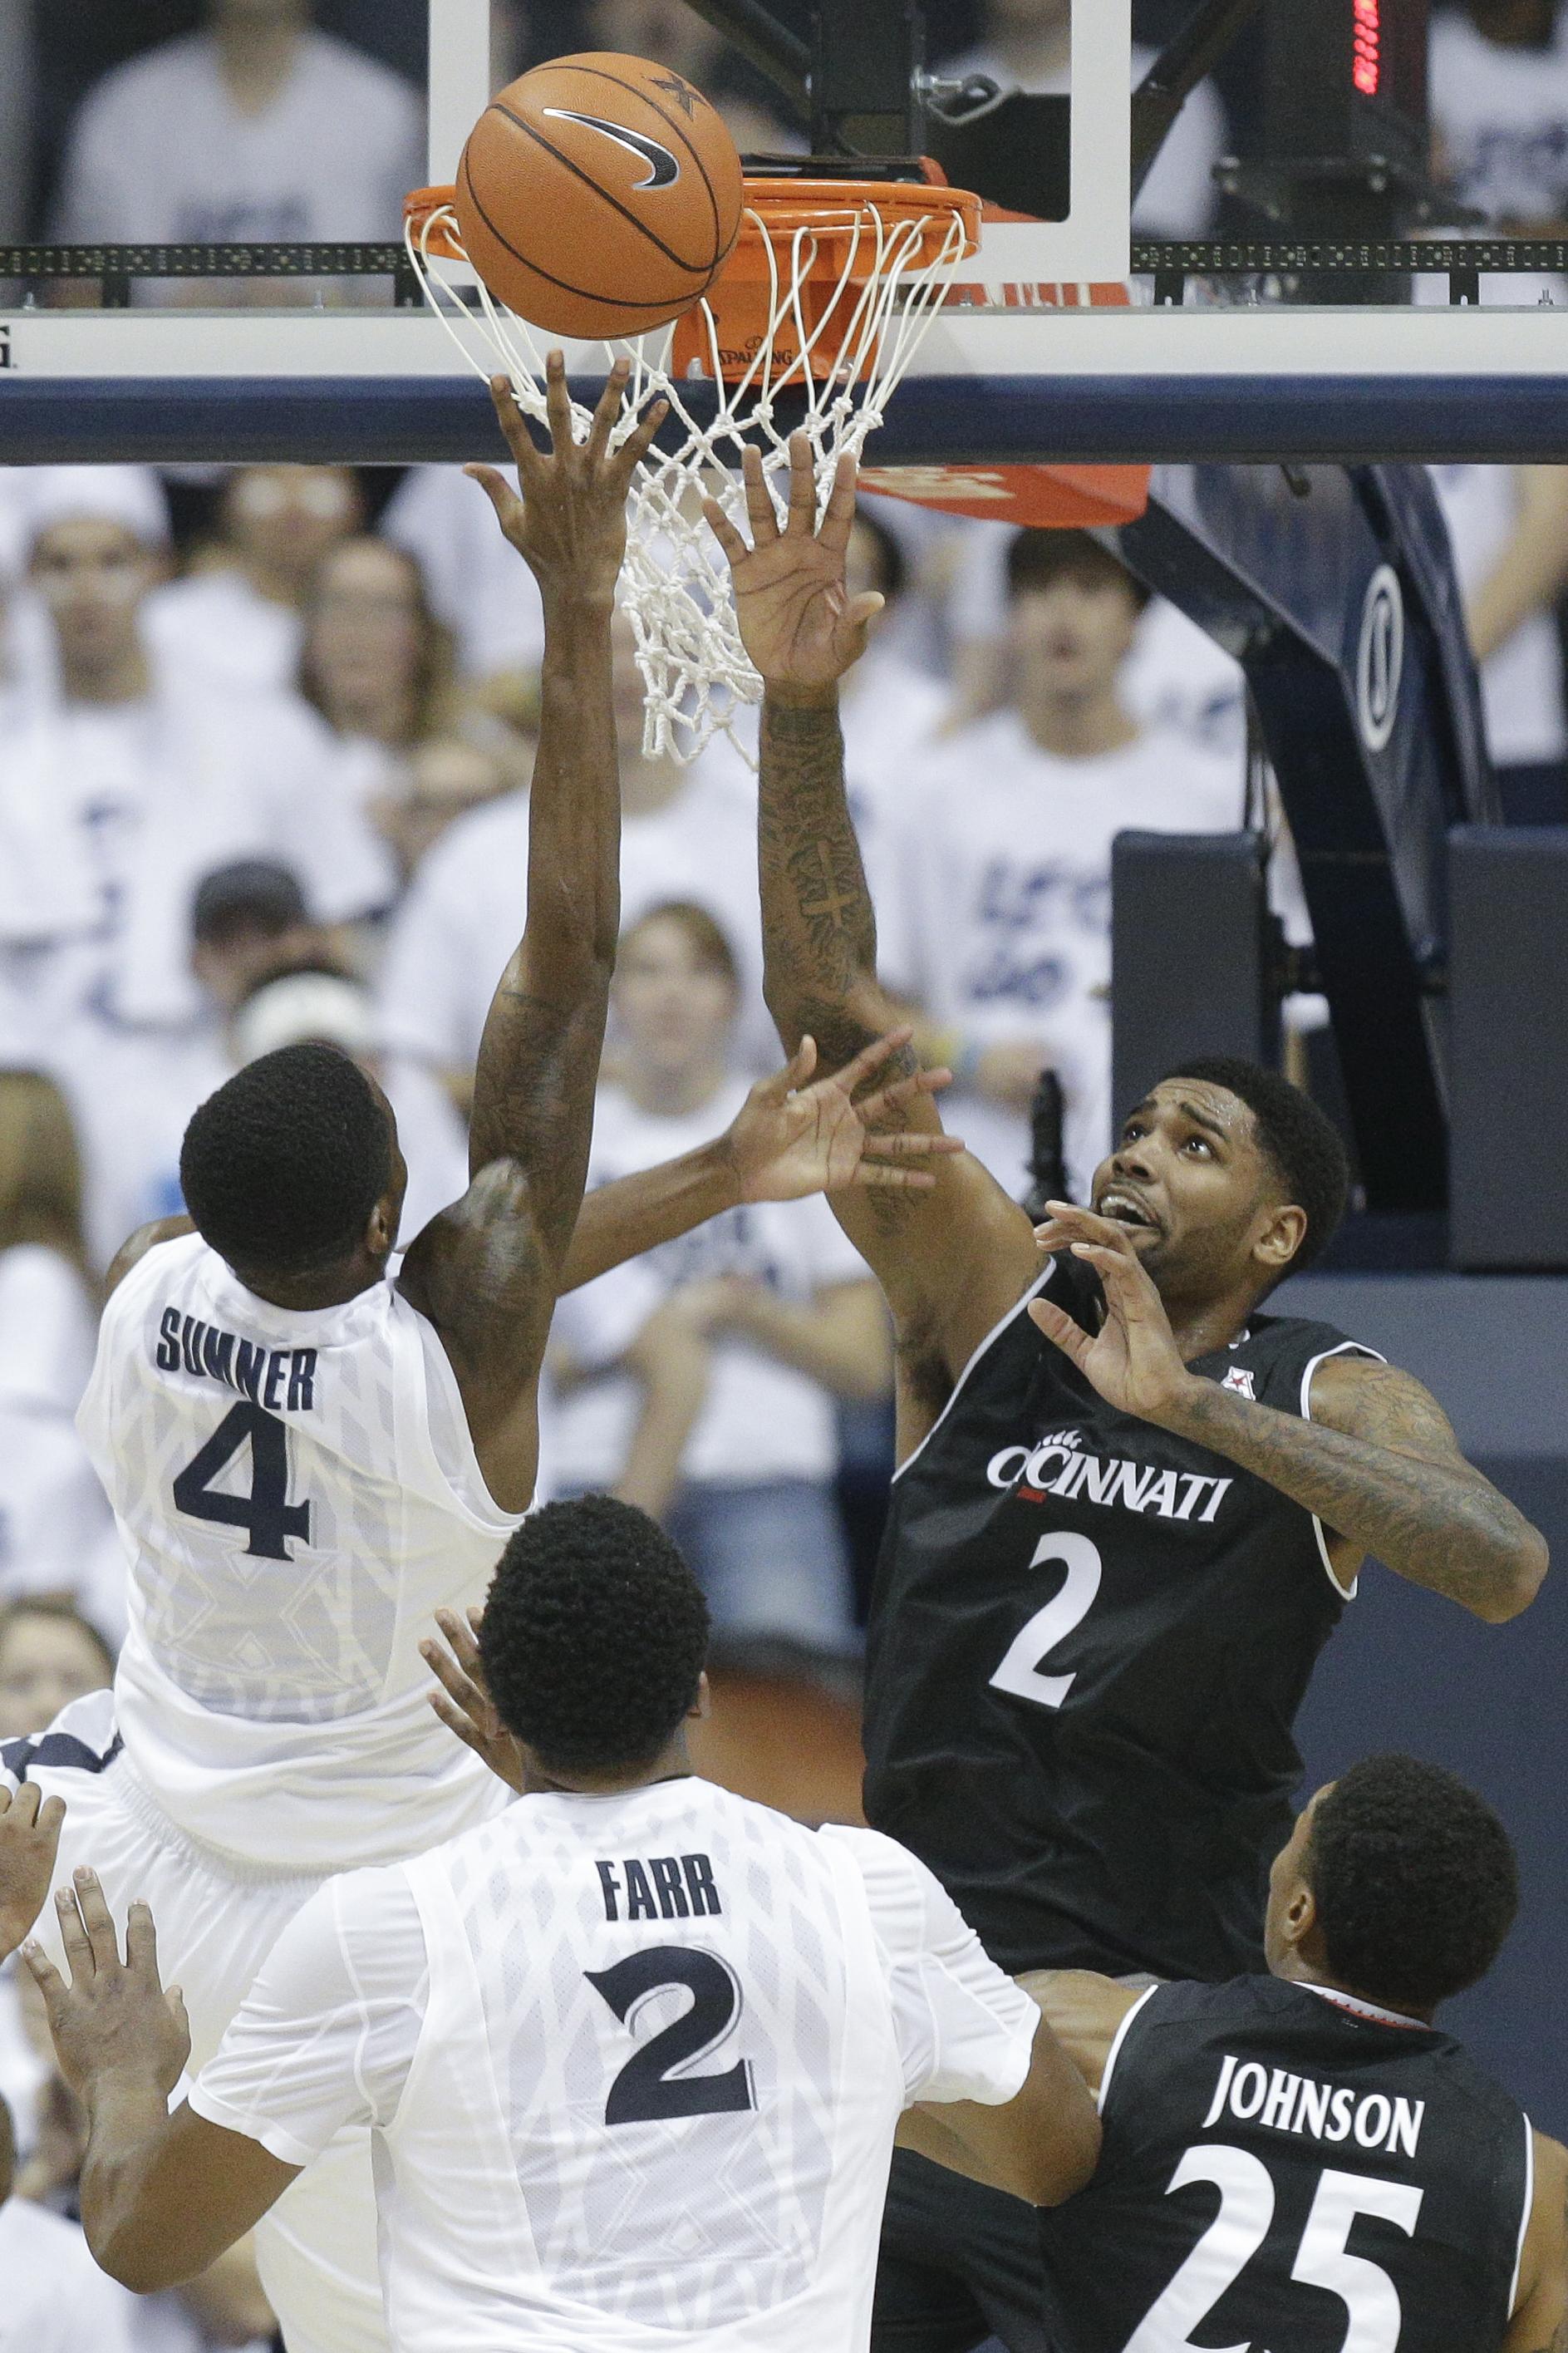 Xavier's Edmond Sumner (4) shoots over Cincinnati's Octavius Ellis (2) in the first half of an NCAA college basketball game, Saturday, Dec. 12, 2015, in Cincinnati. (AP Photo/John Minchillo)